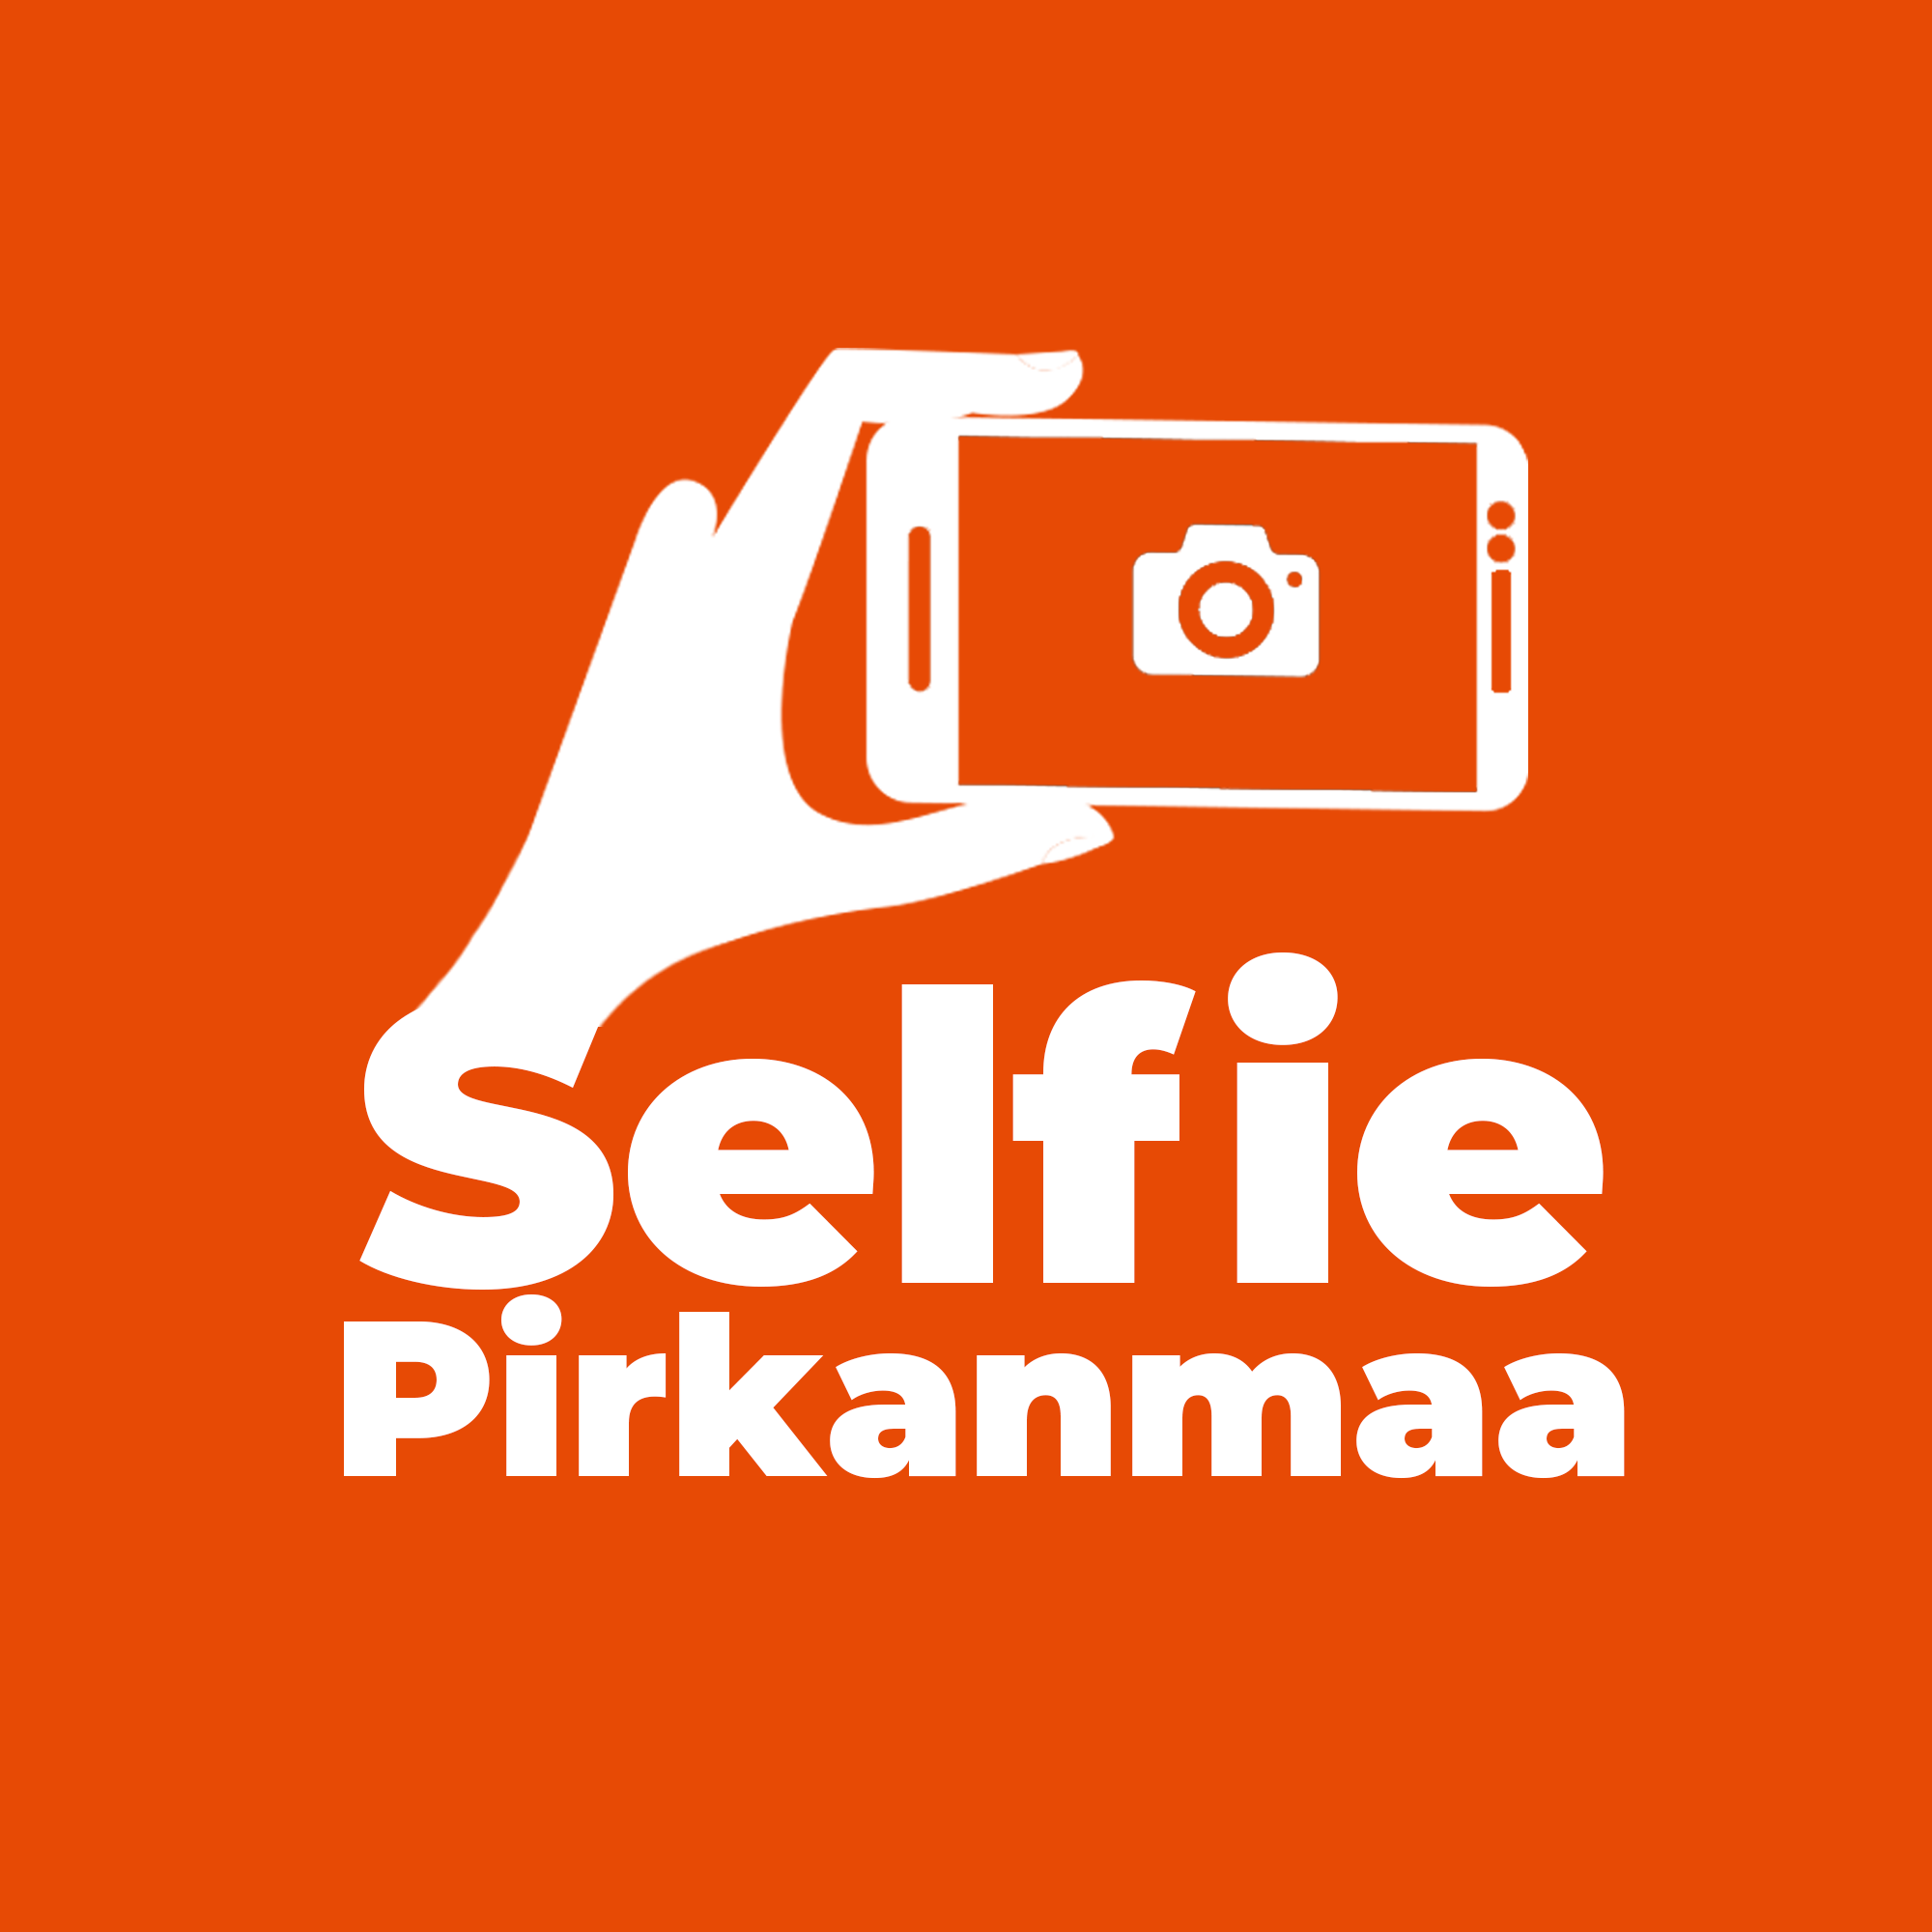 Selfien Pirkanmaa kampanjan logo.